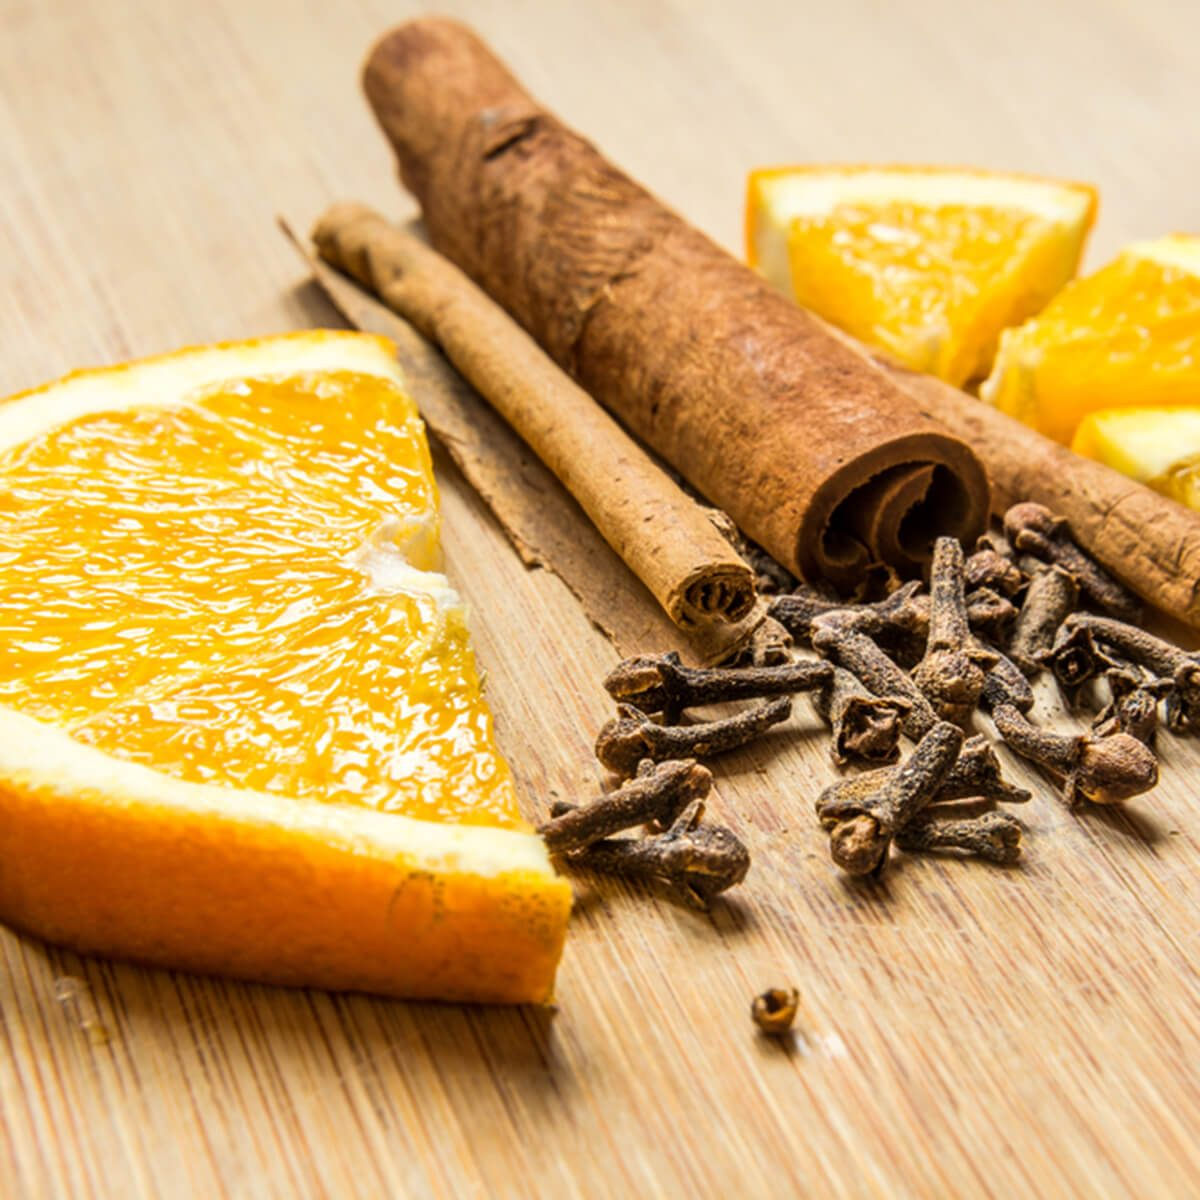 Orange slices and spices